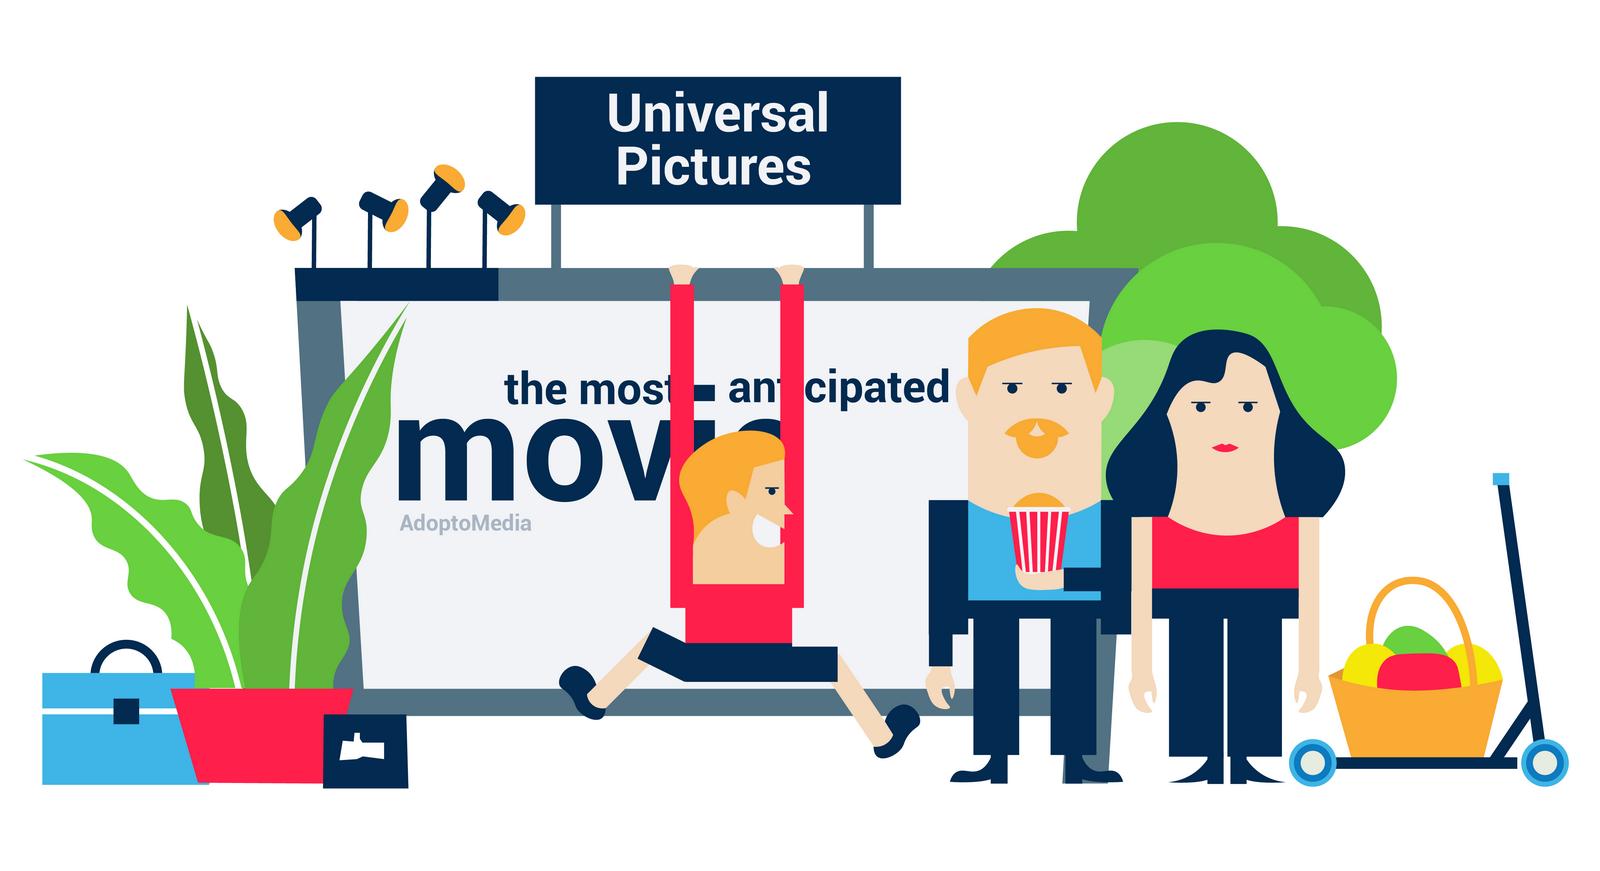 AdoptoMedia, Universal Pictures, advertising, OOH advertising, poster,